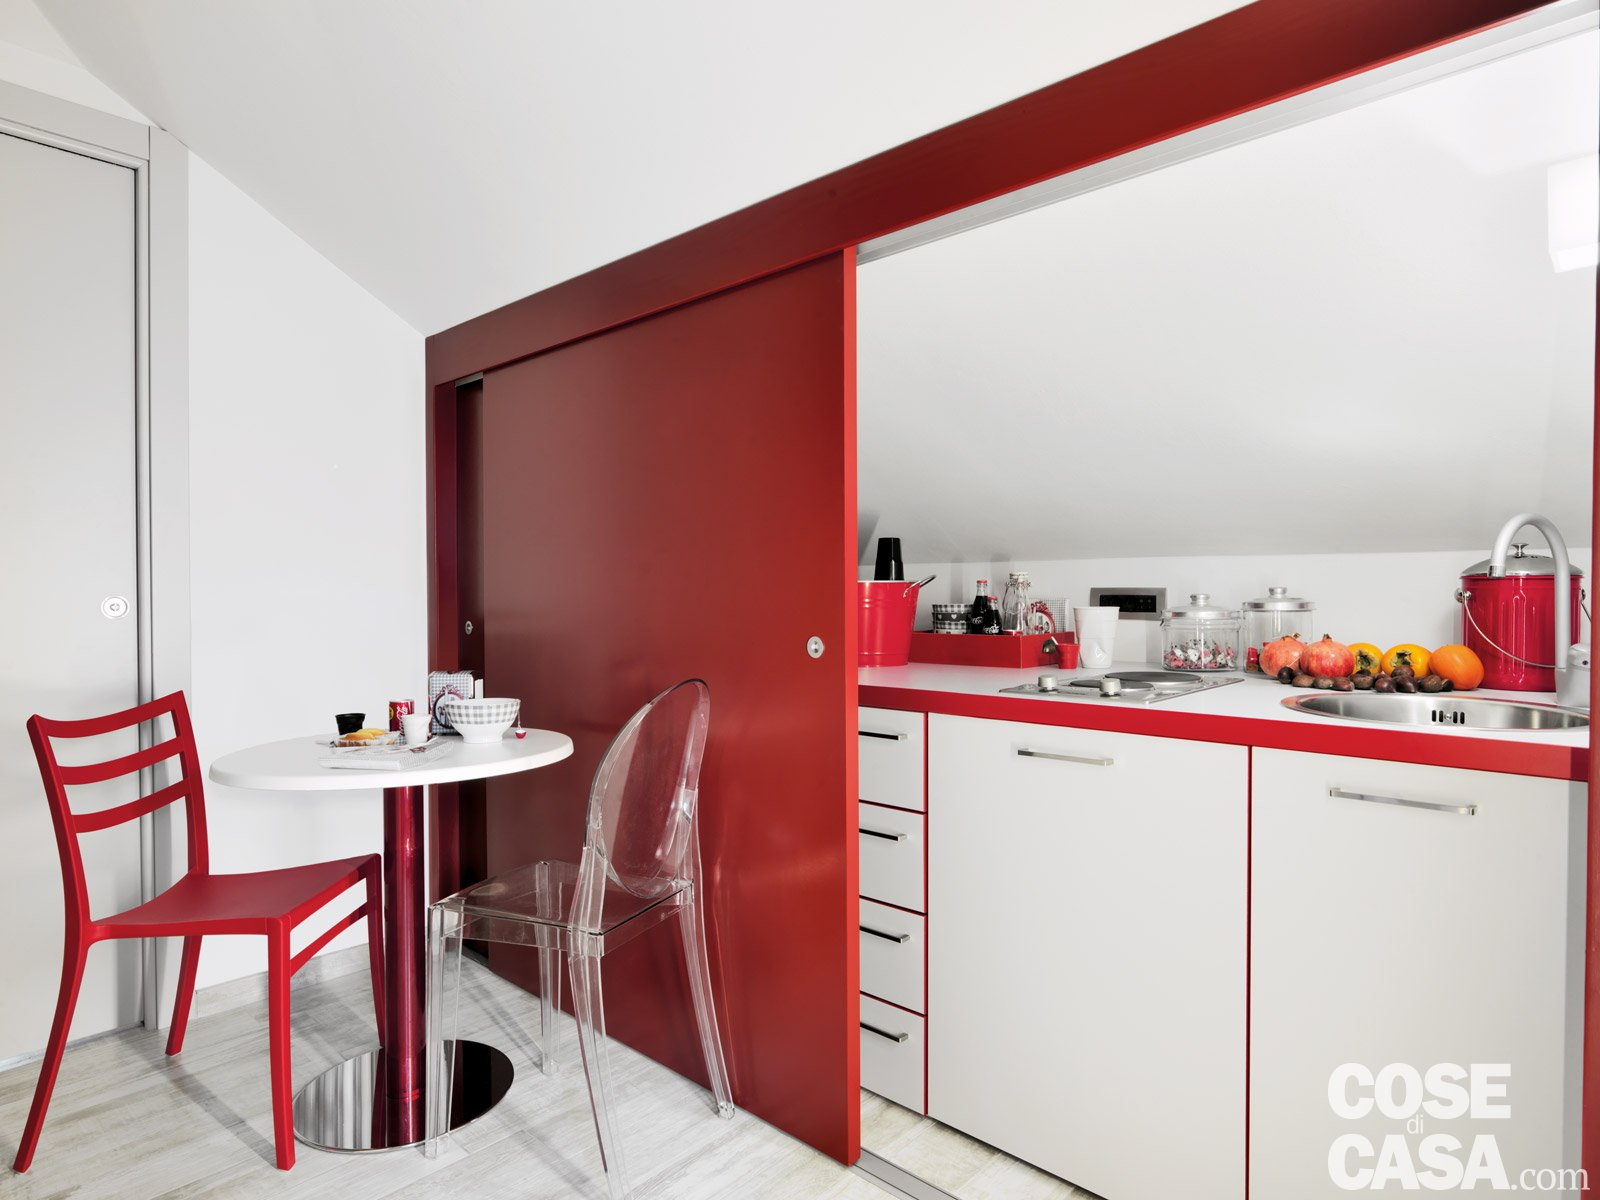 Trilocale di 96 mq recupero creativo per la mansarda cose di casa - Cucine per mansarde basse ...